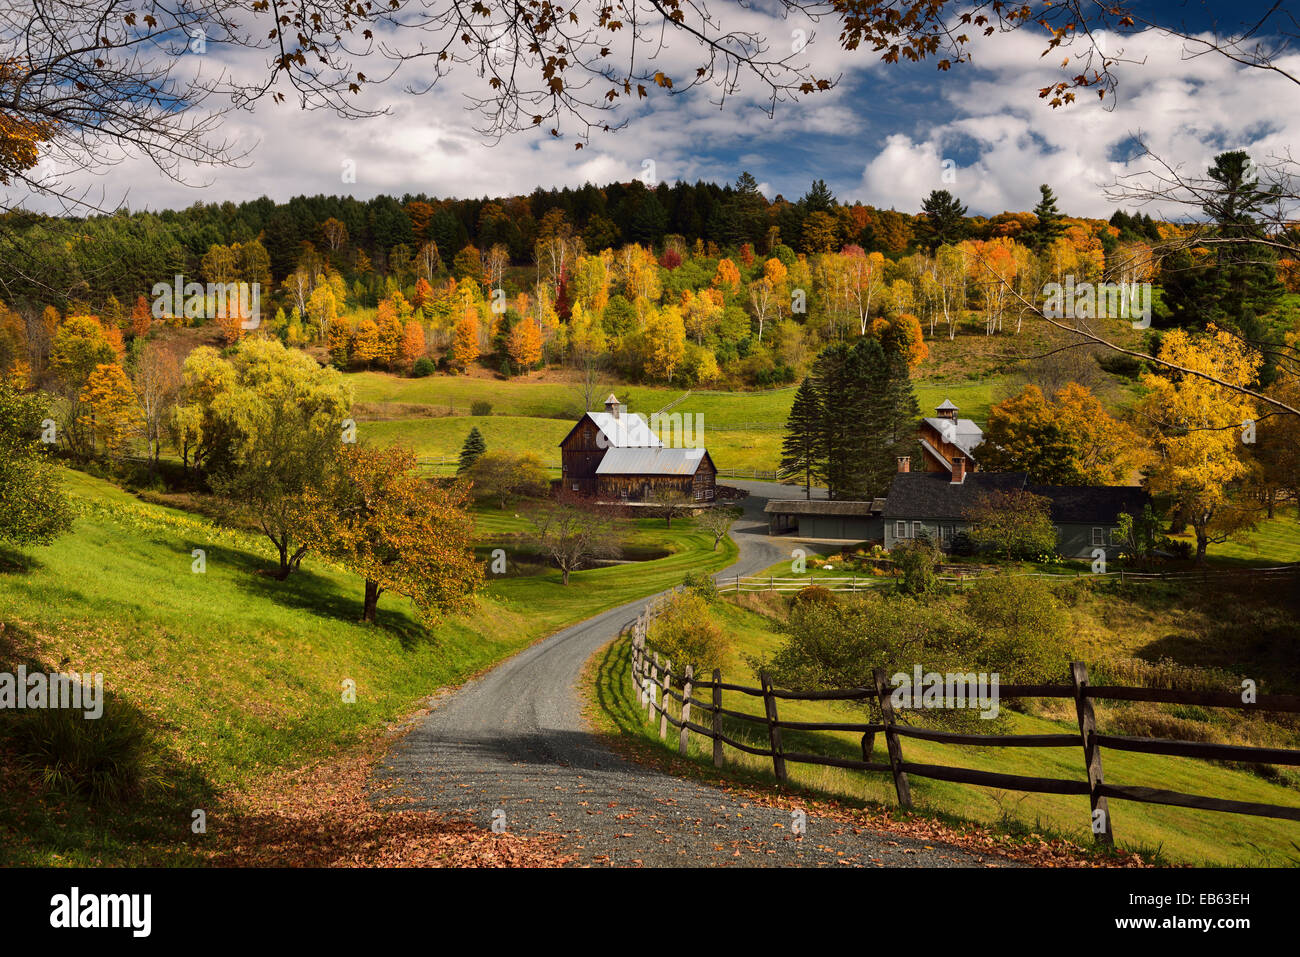 Fall Foliage Wallpaper Hd Fall Tree Colors At Sleepy Hollow Farm Homestead On